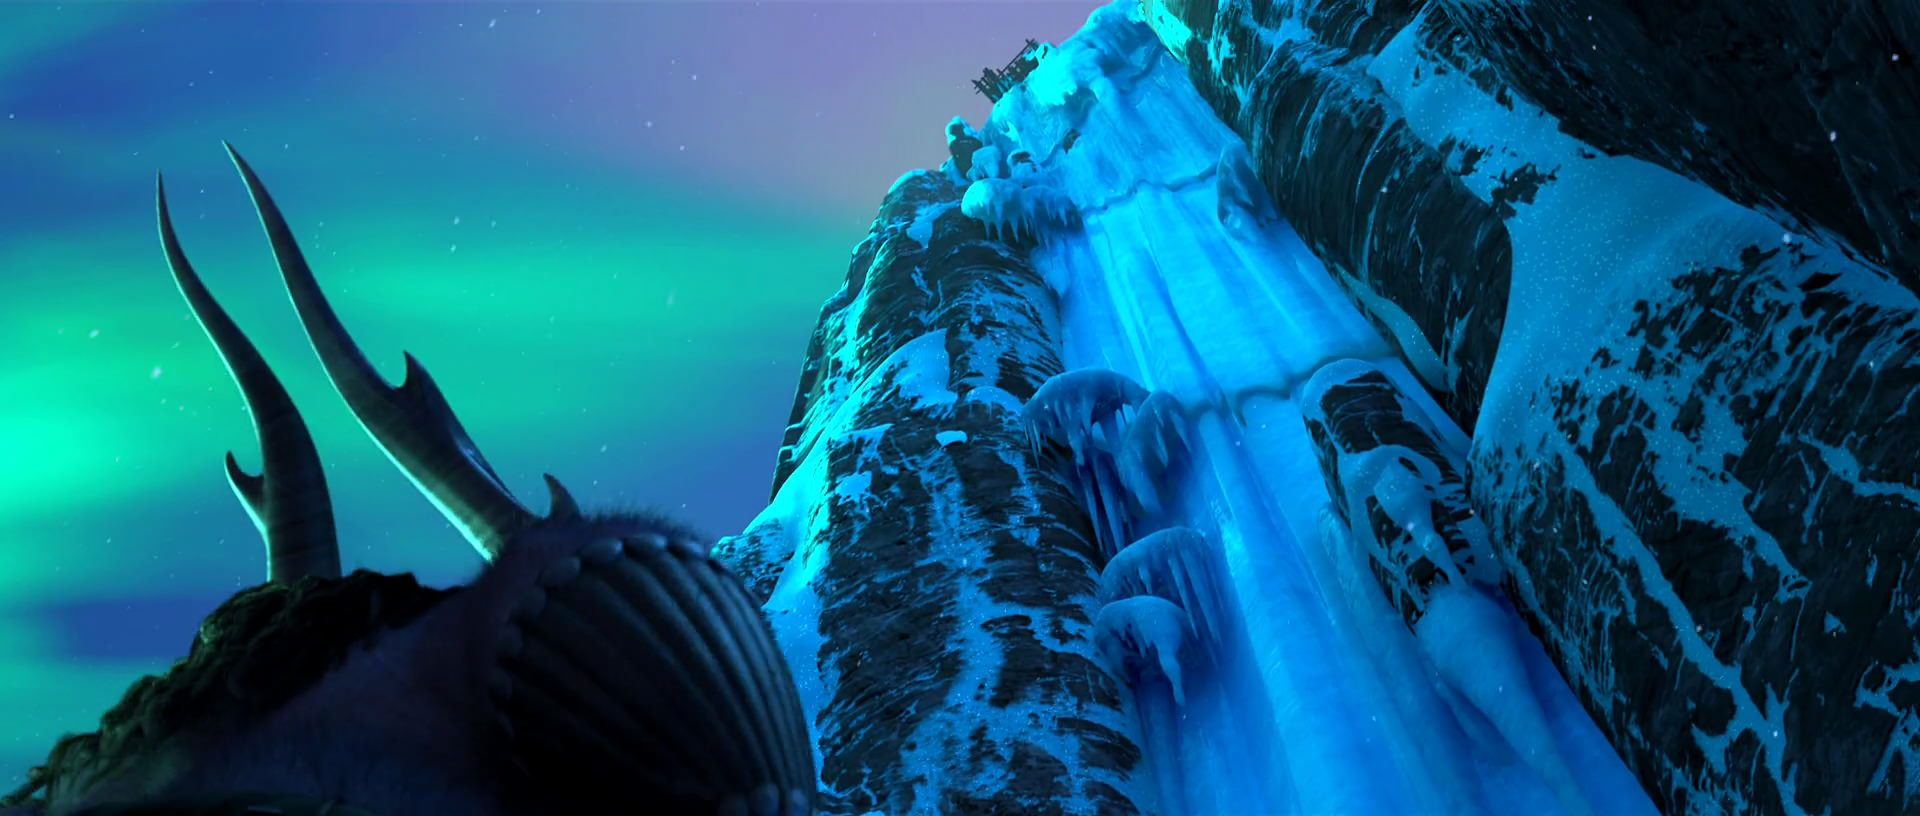 Waterfall-kai.jpg